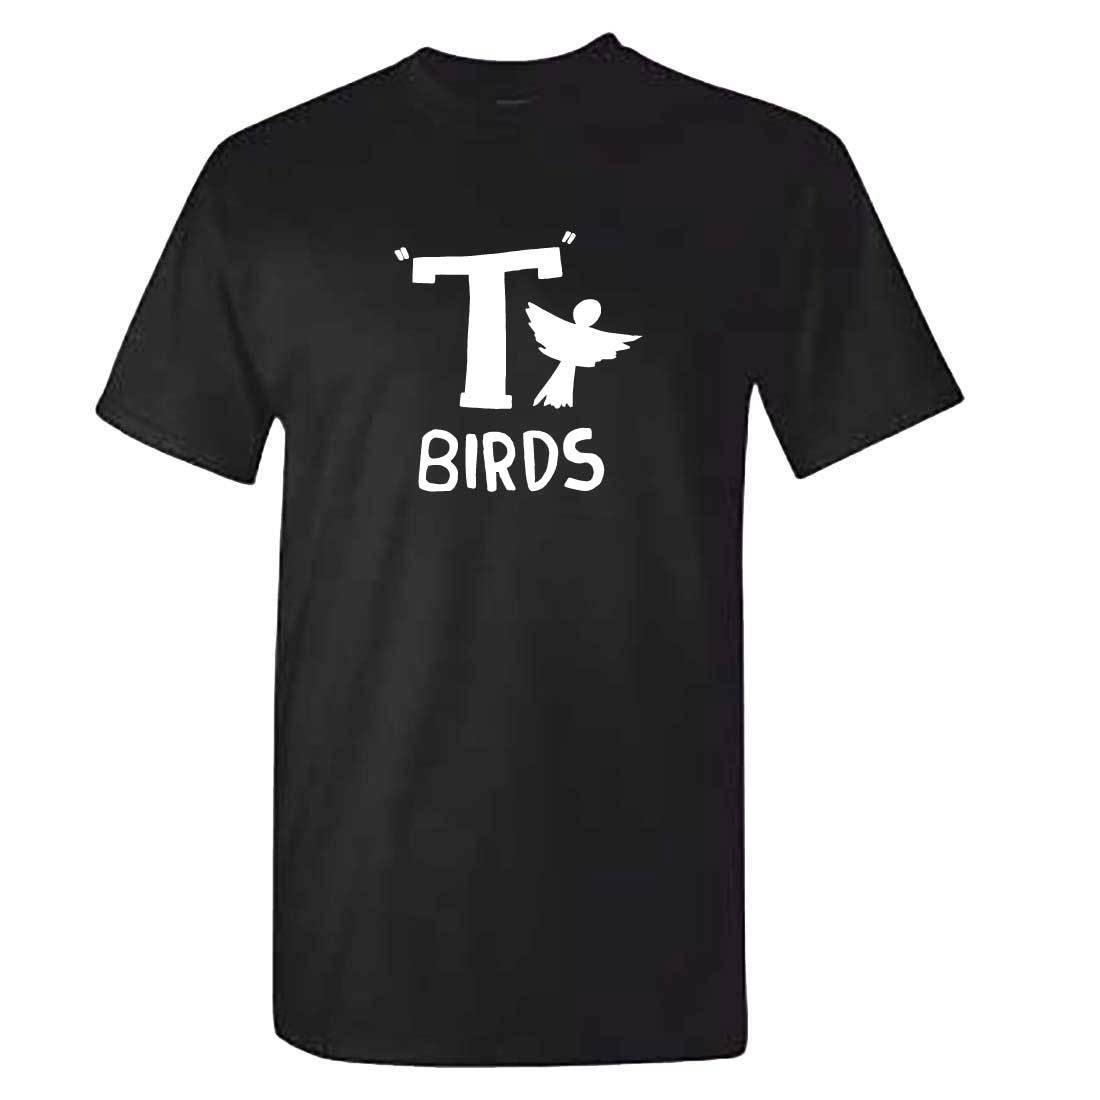 T Birds T Shirt - Mens Kids Childrens - T Birds T-shirt - Grease Fancy Dress for Male/Boy T Shirt Hot 2018 Fashion